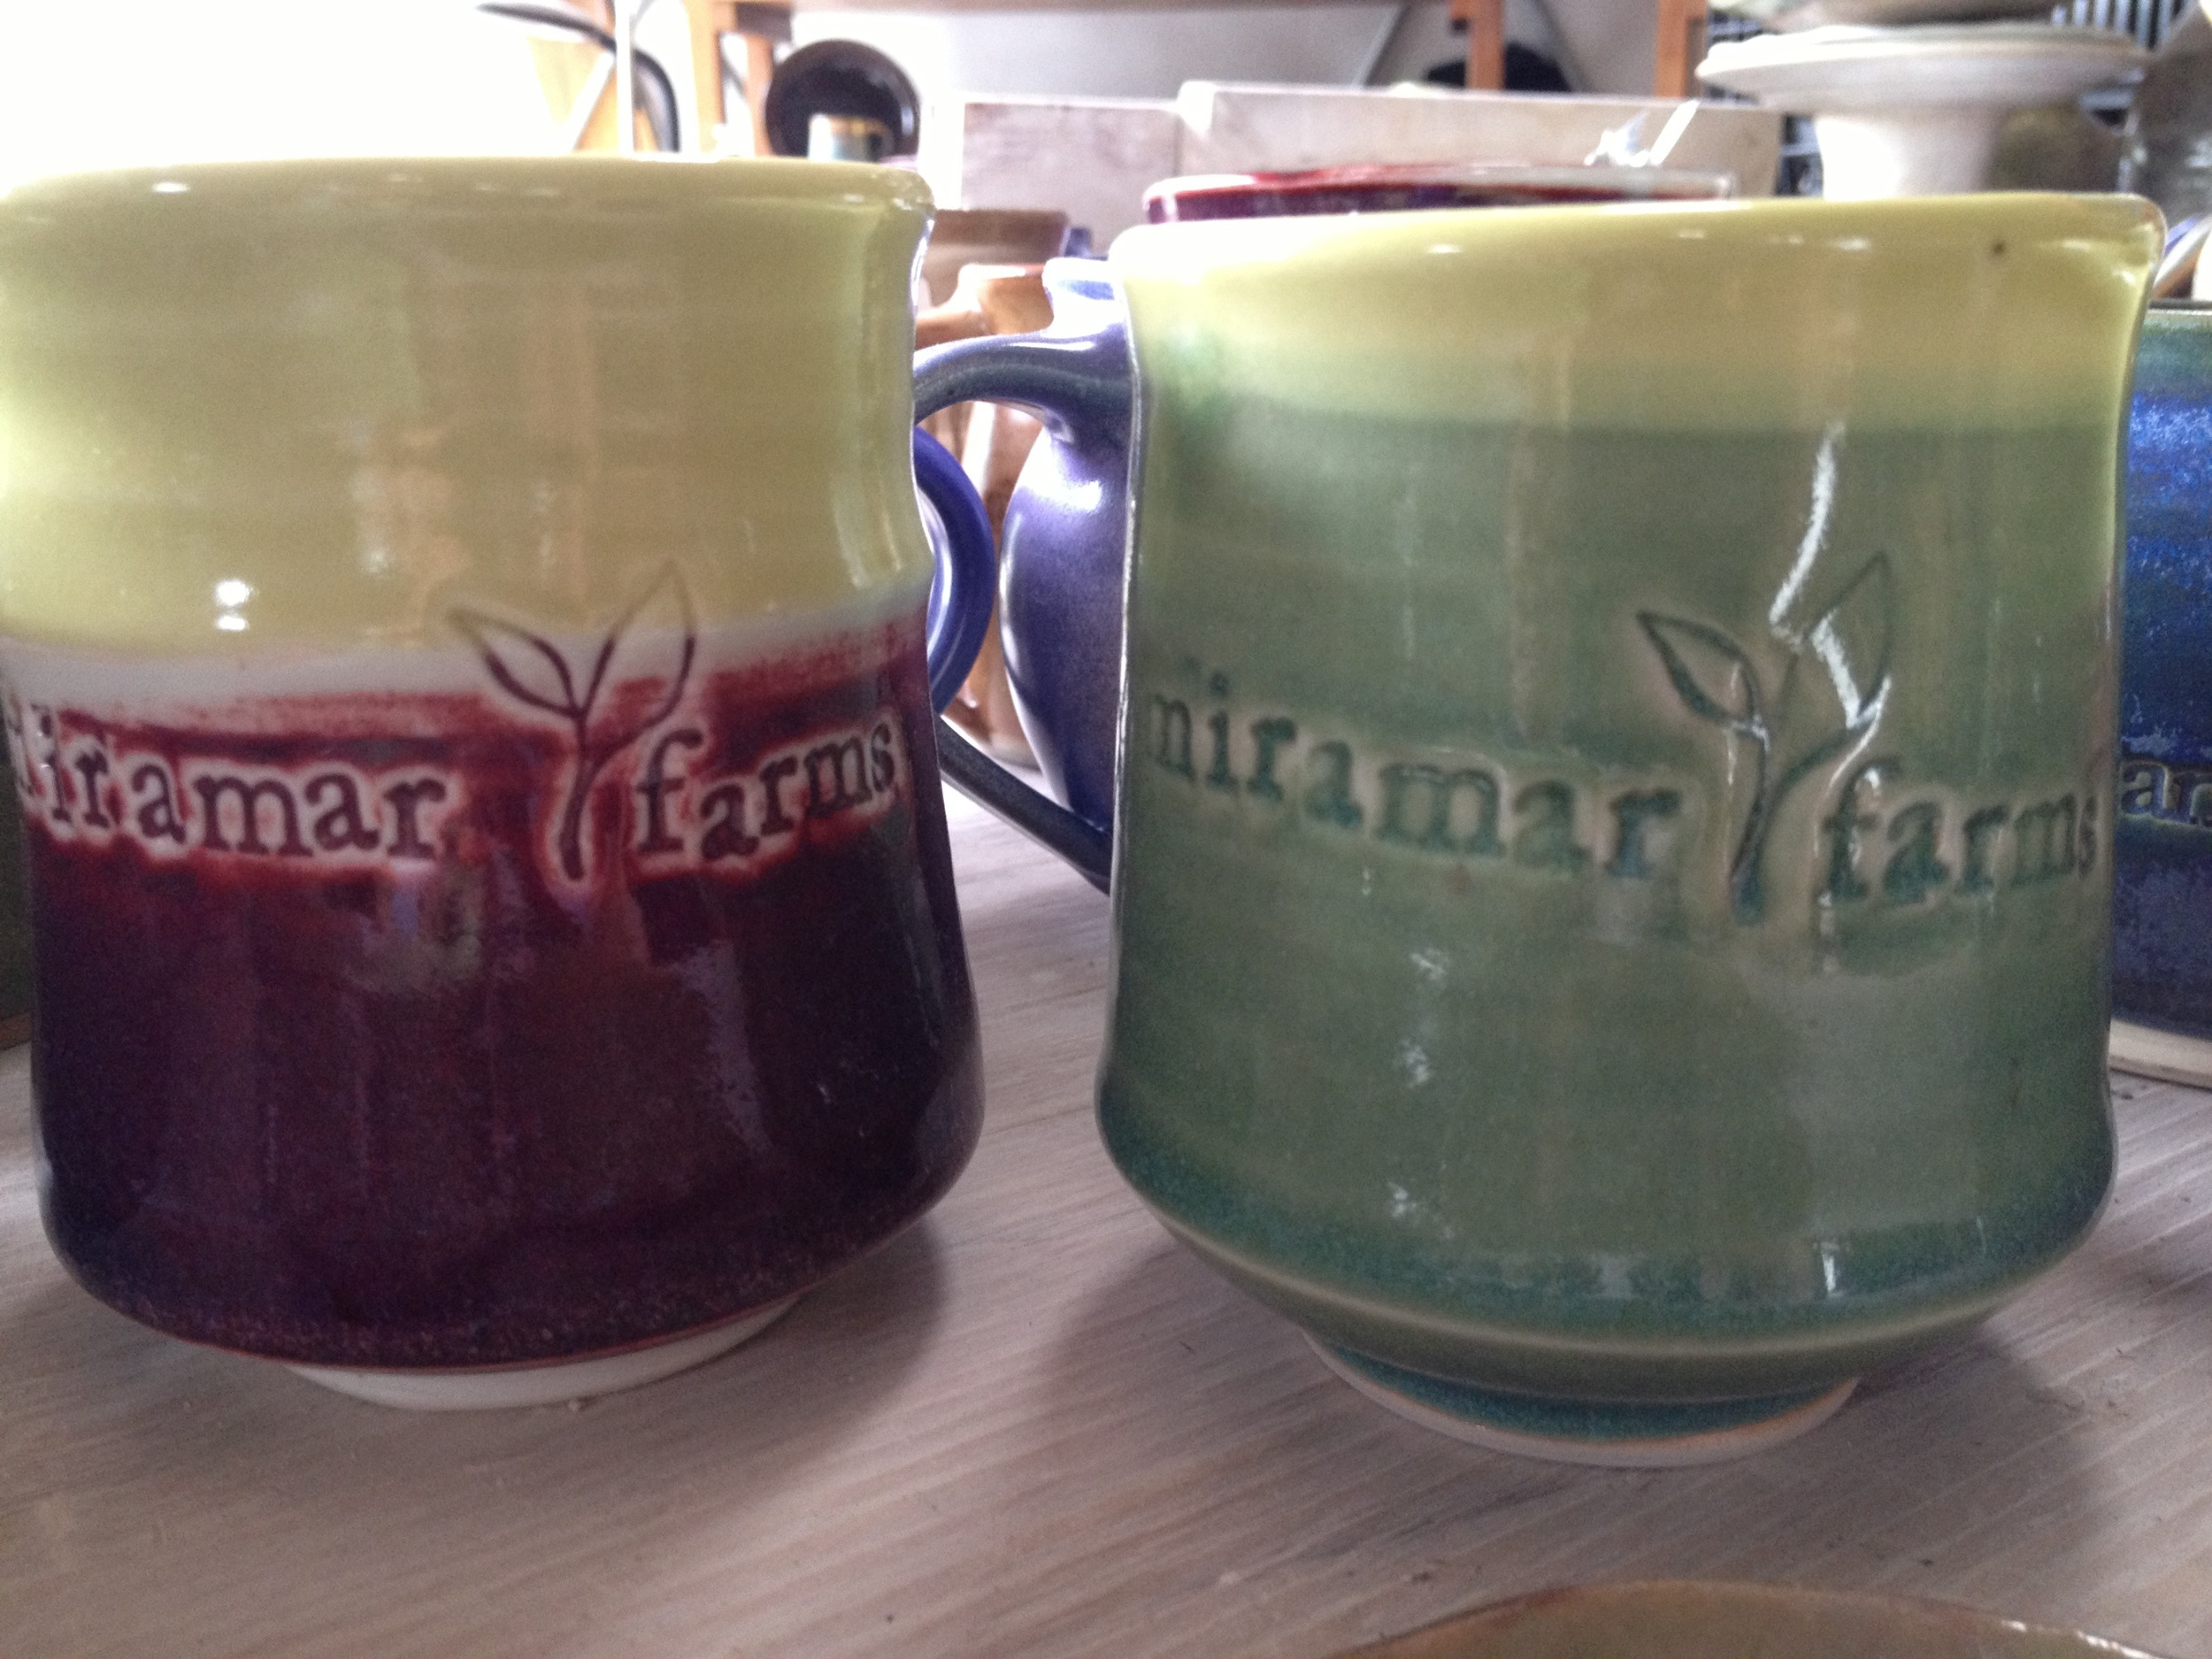 Miramar Farms teacups